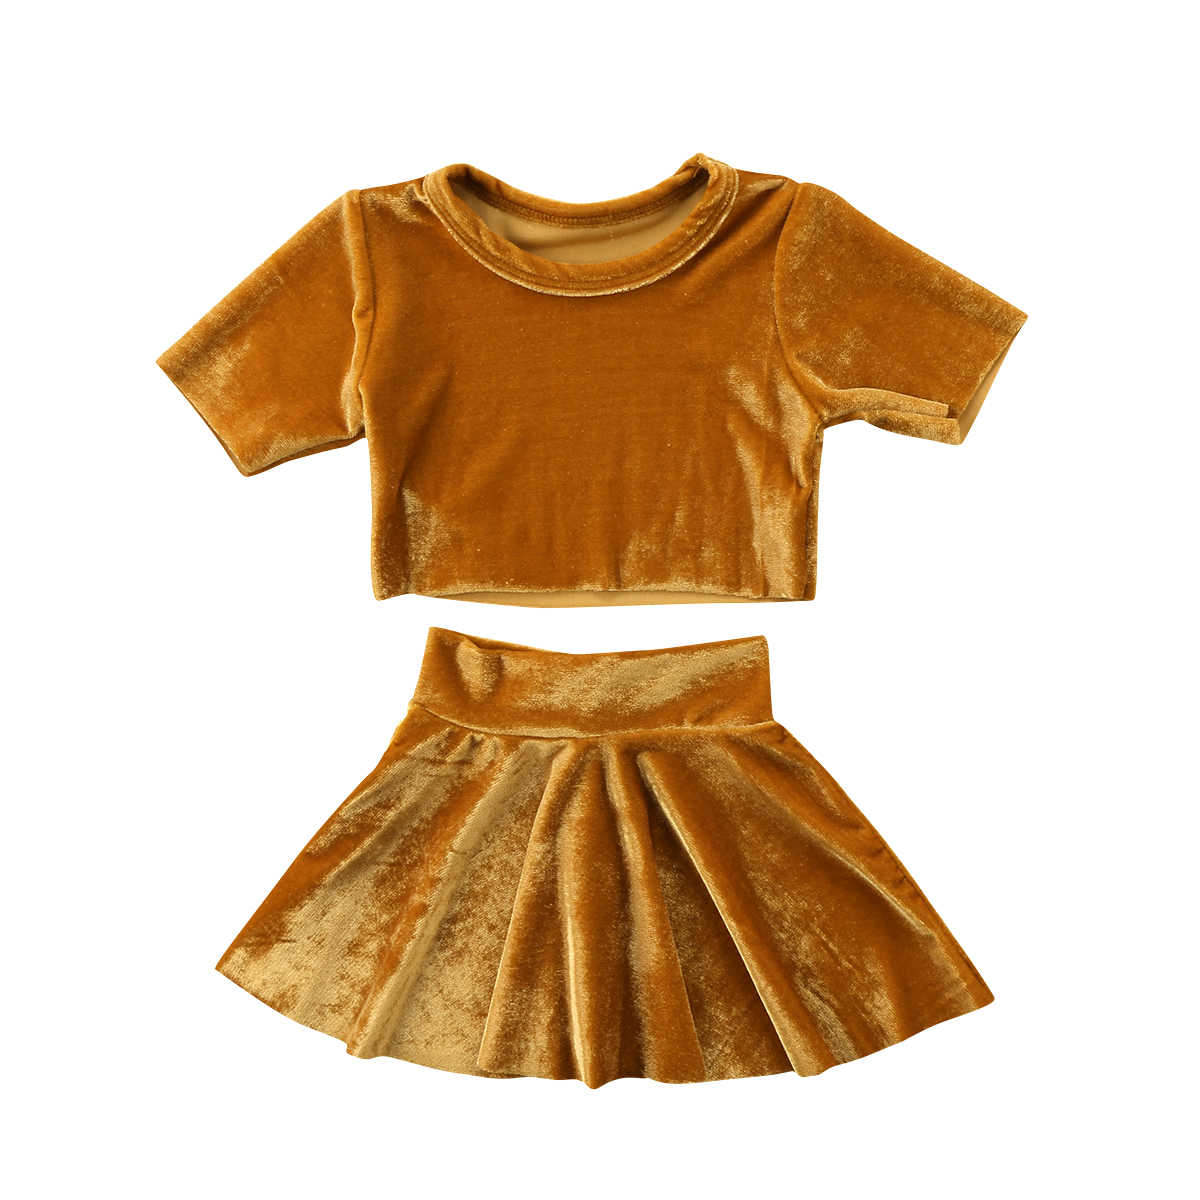 3f7bc5199f2 Vintage Kids Baby Girls Velvet Clothes Set Gold Crop Top T-shirt+Skirts  Princess